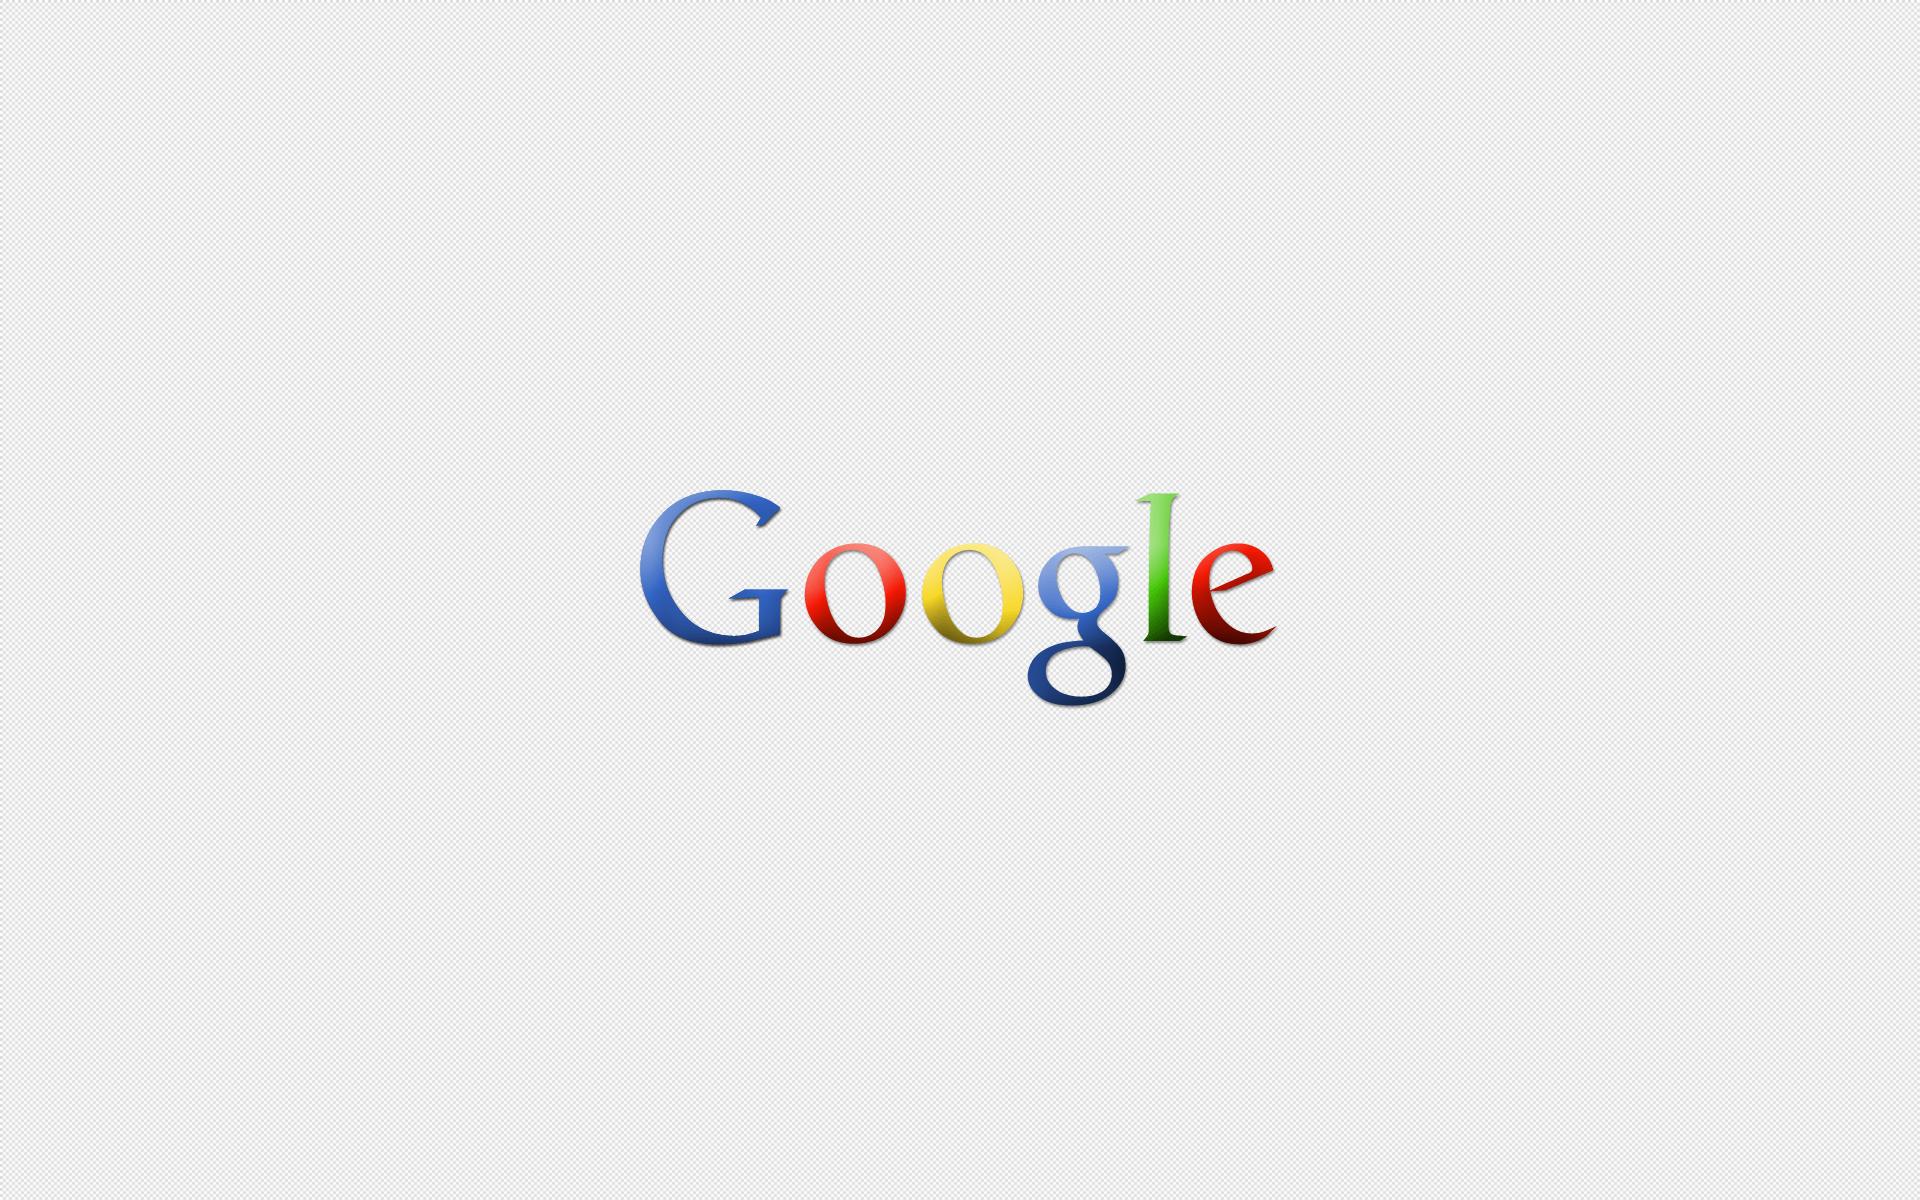 Google Hd Wallpaper | Wallpaper Download